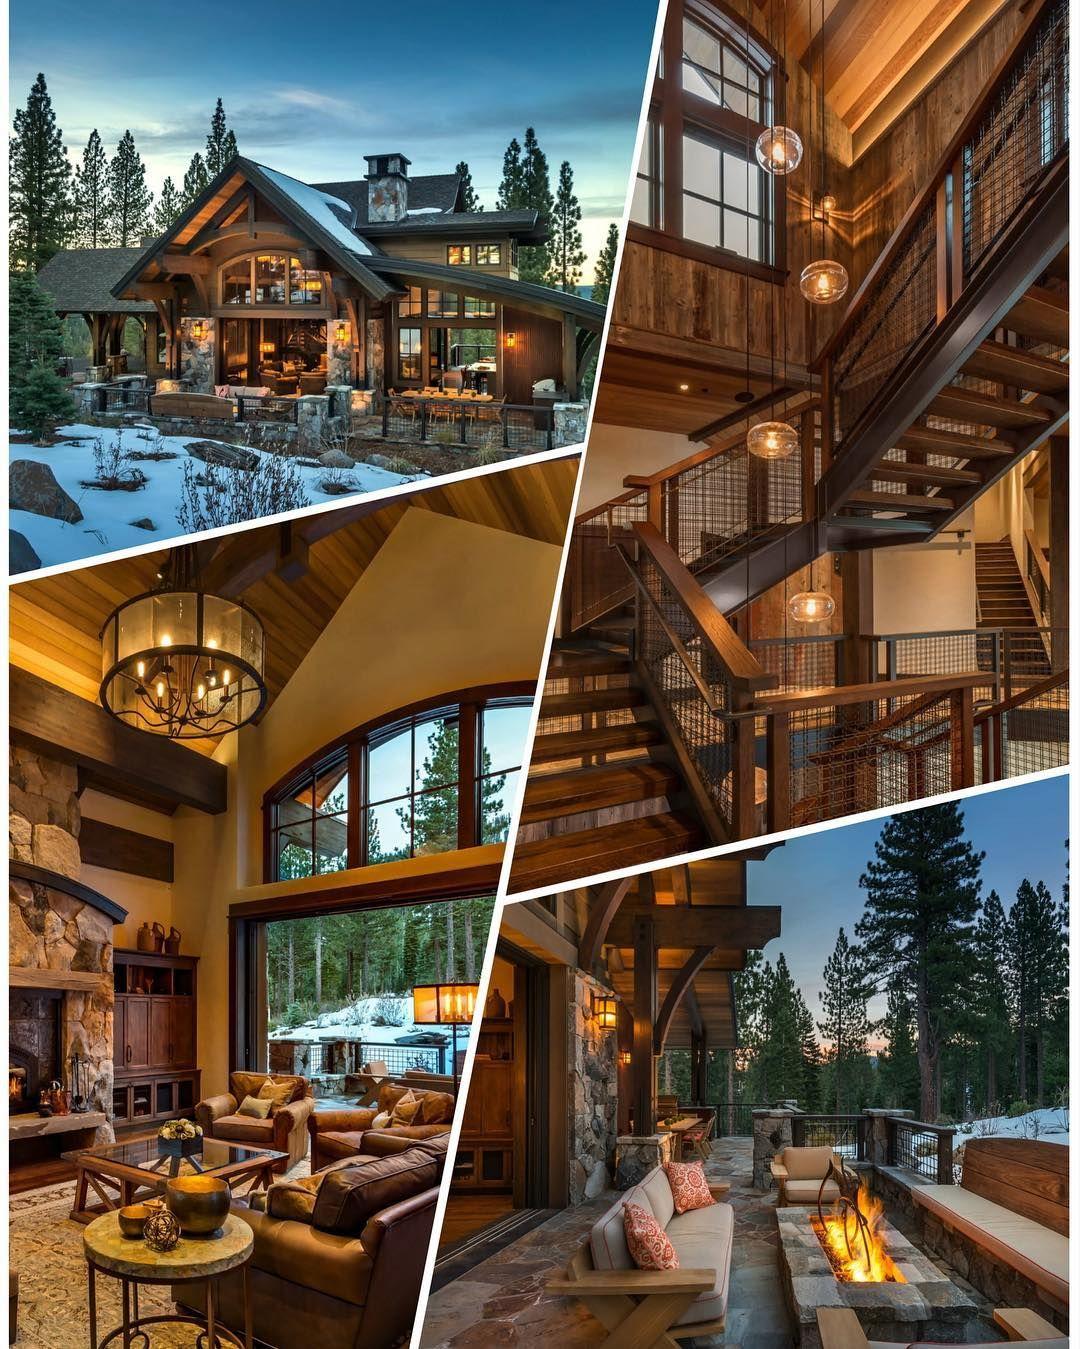 Home Plate Lodge styleestate Home Plate Lodge